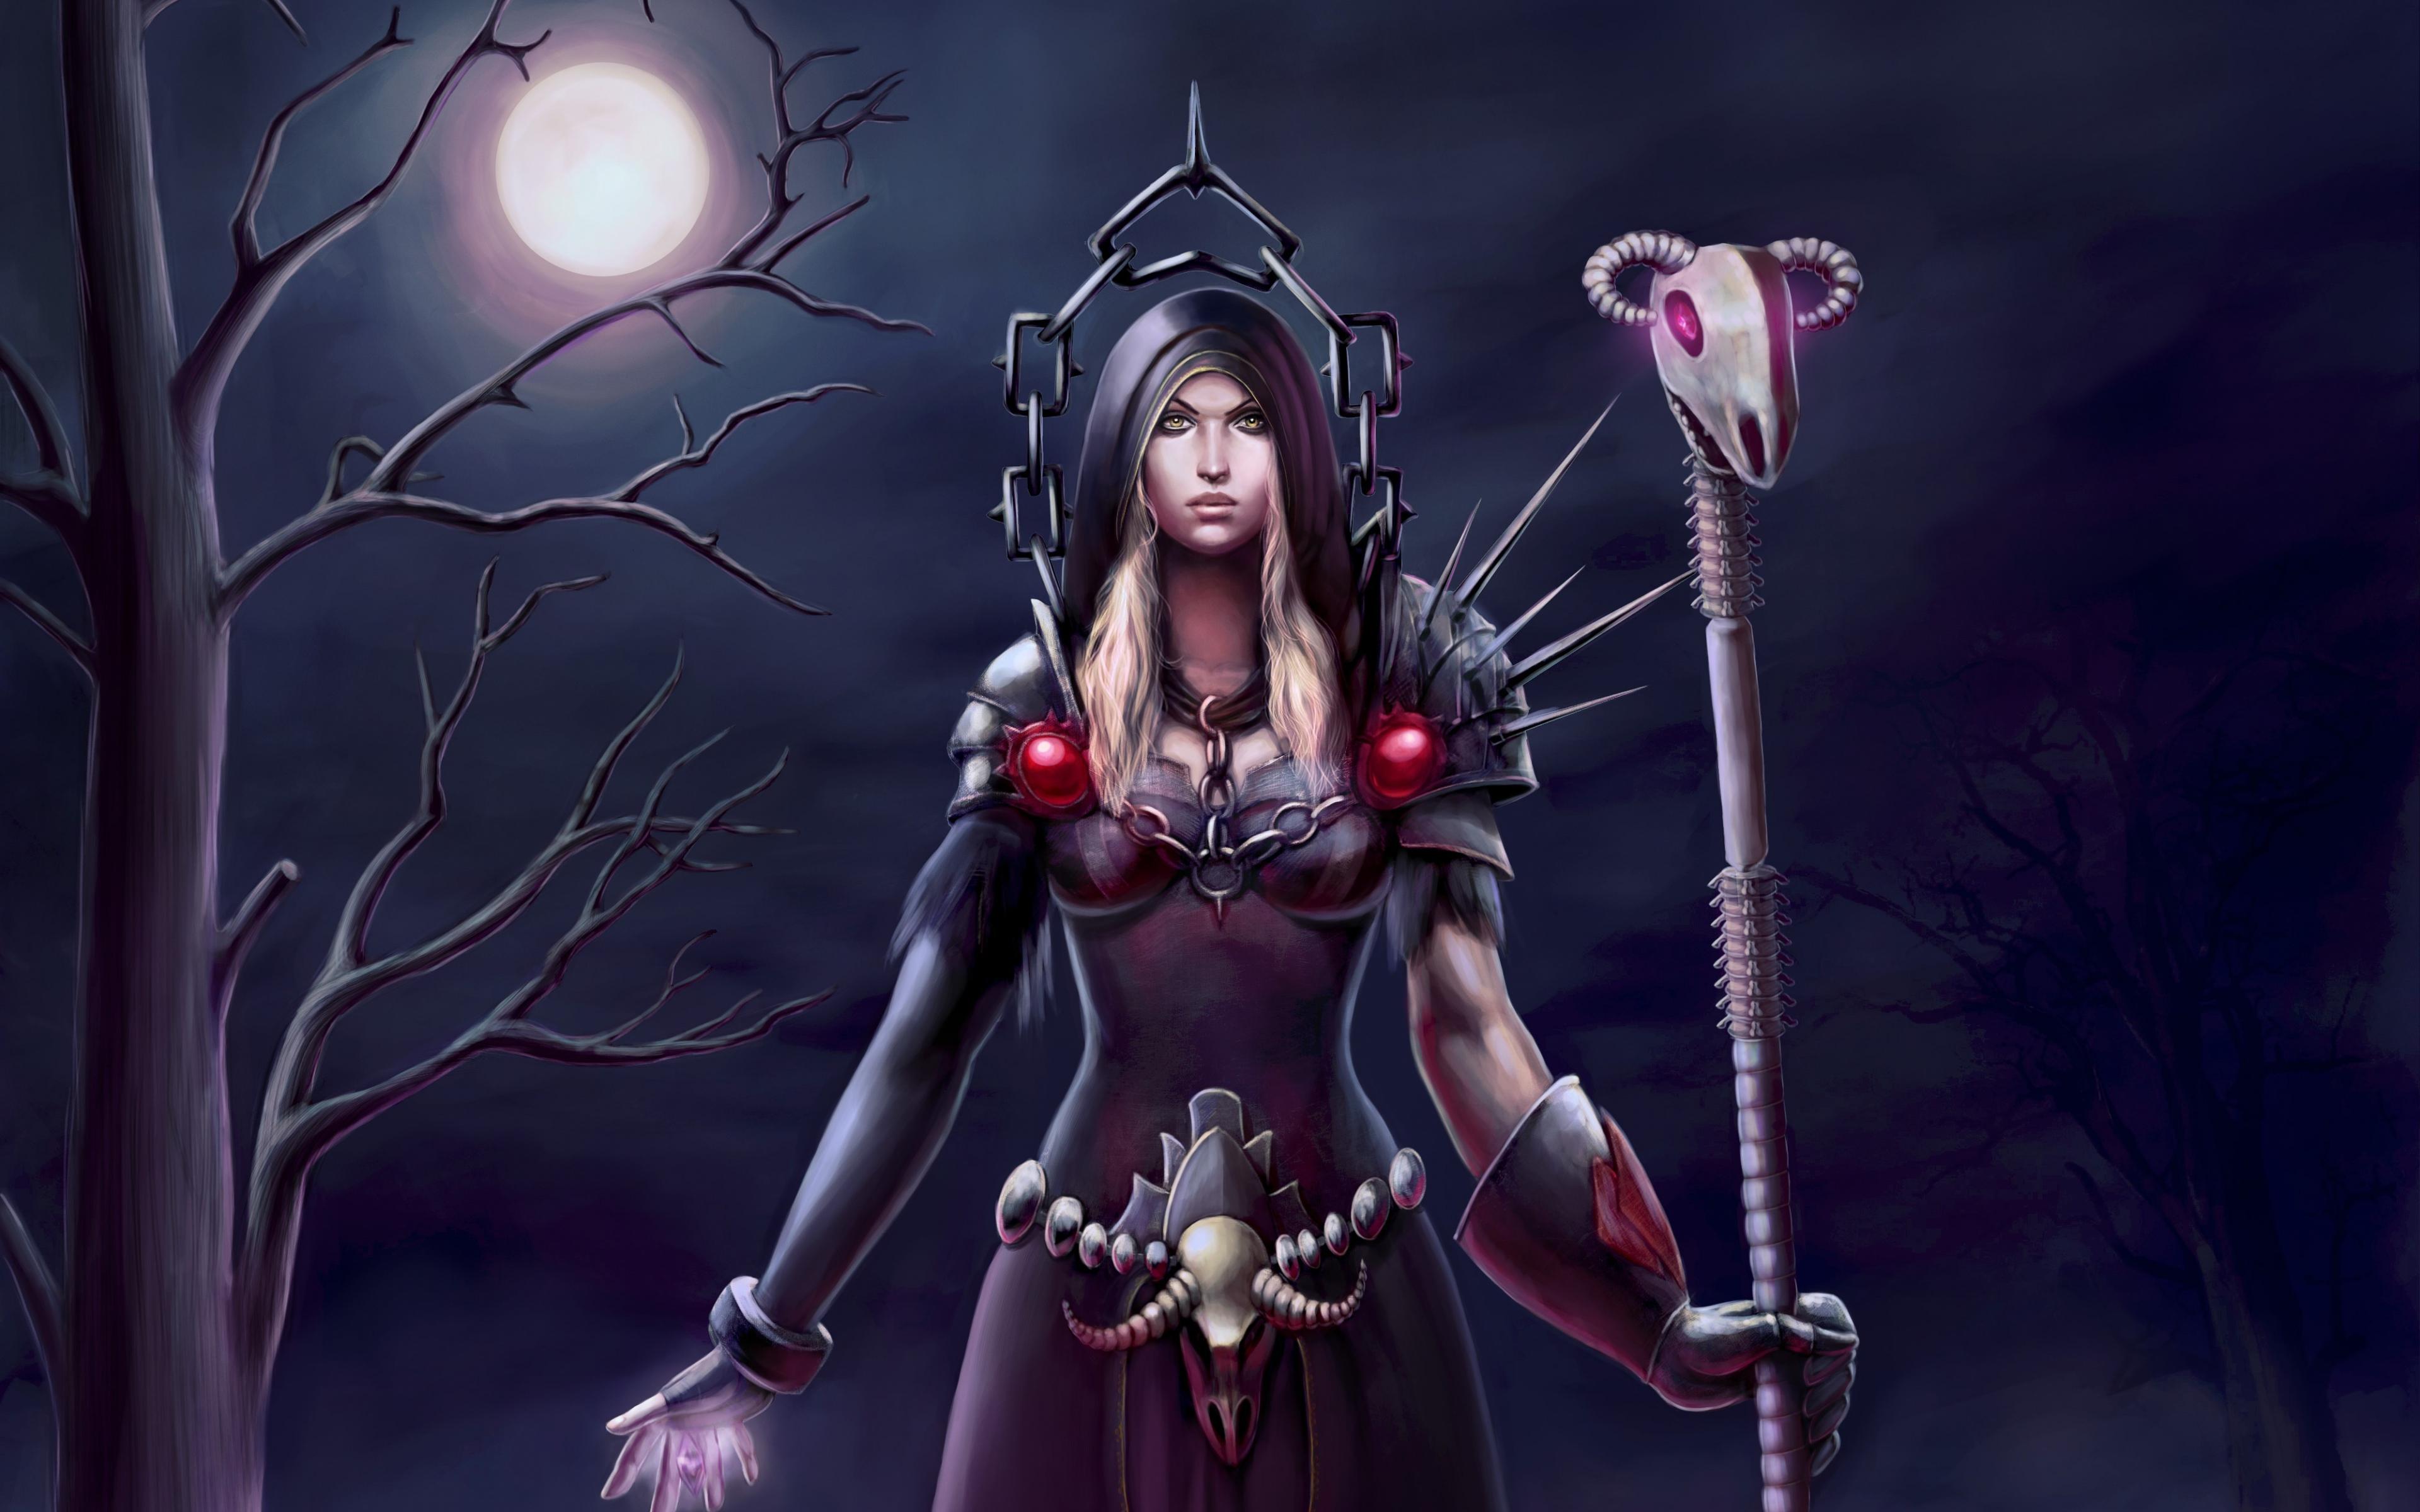 3840x2400 World of warcraft Warlock Moon Tree Warrior Wallpaper 3840x2400